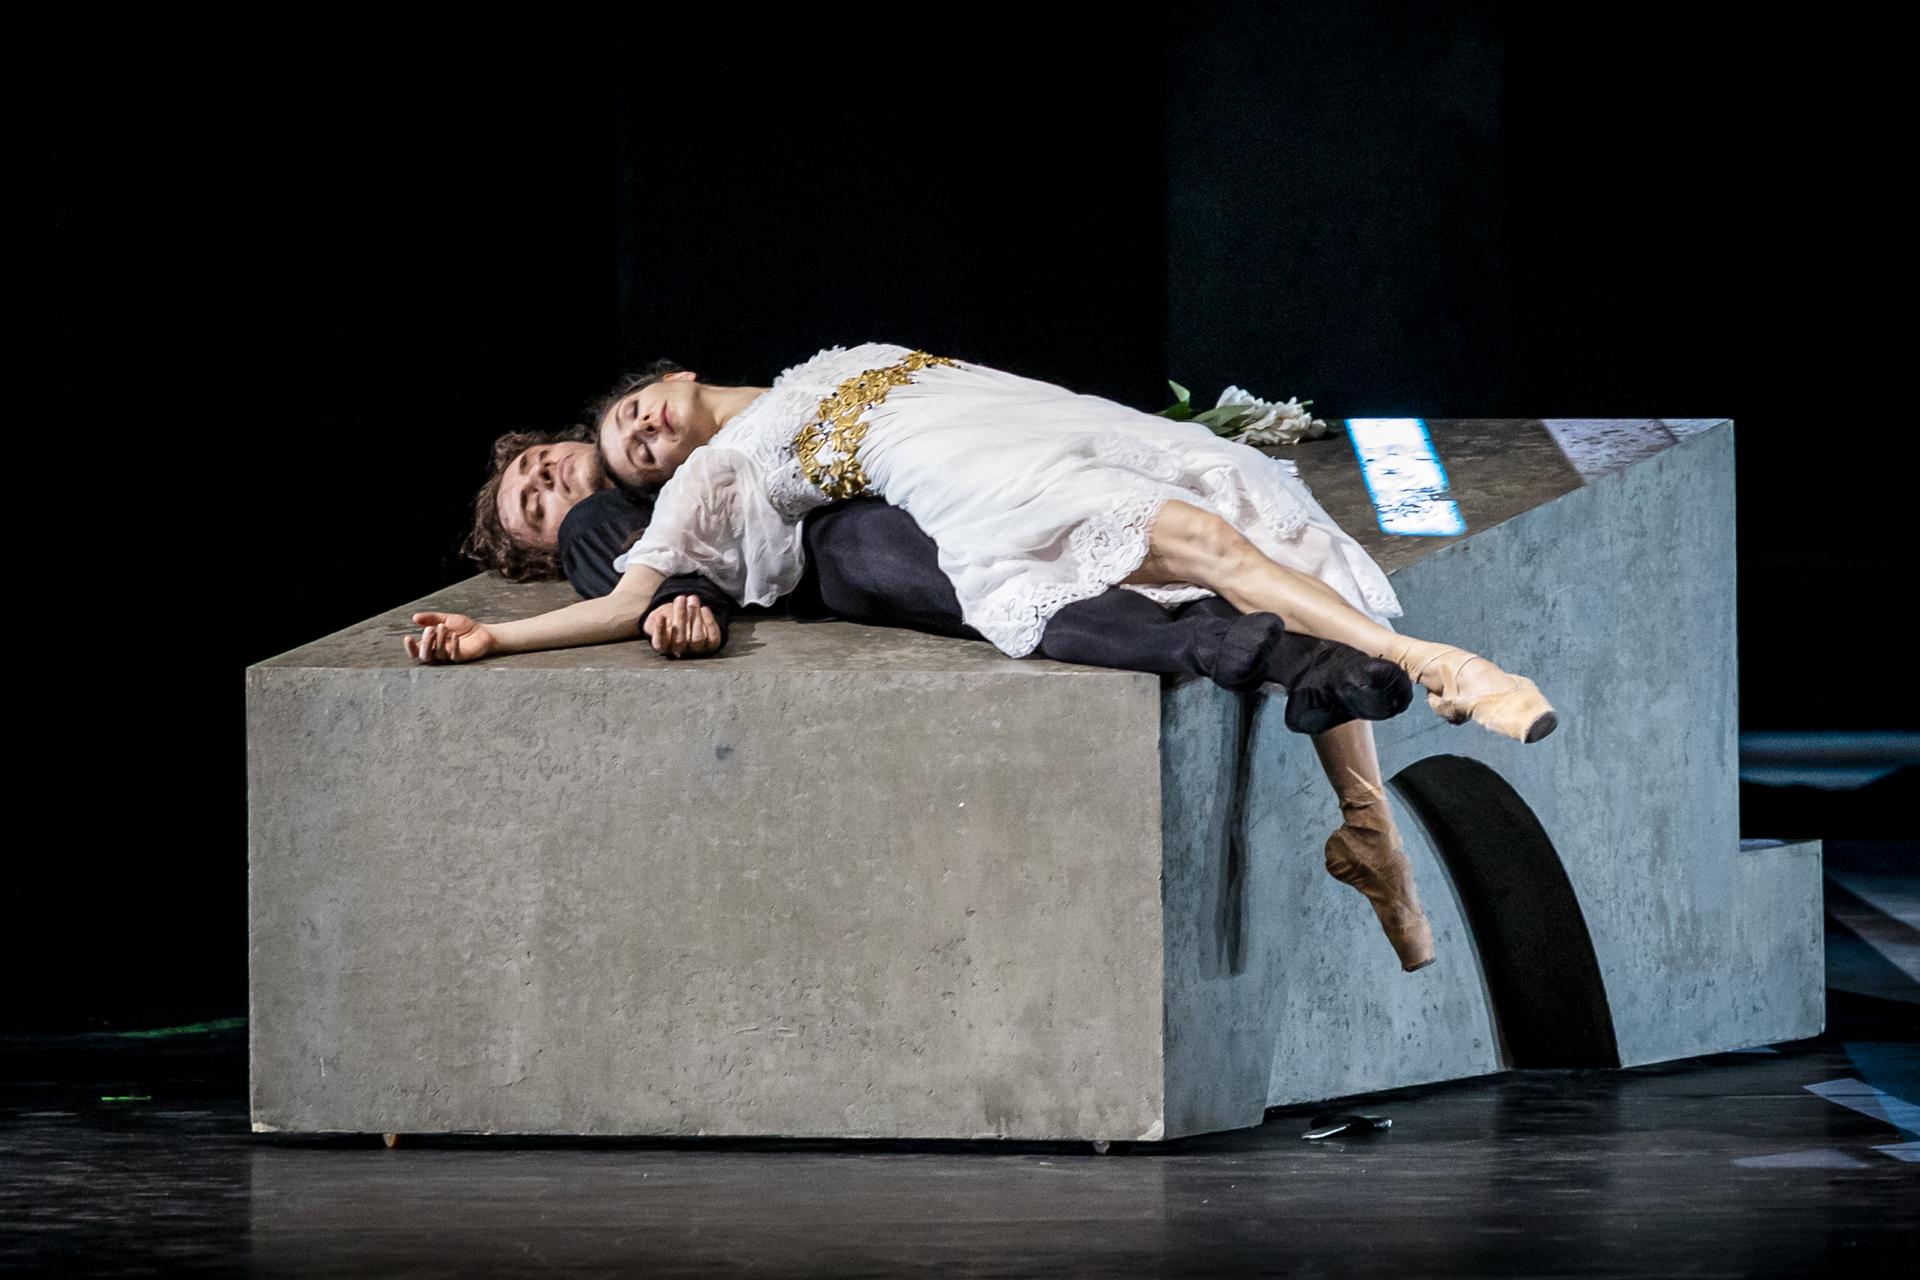 2019_08_26-Romeo-and-Juliet-©-Luca-Vantusso-223833-5D4B1263